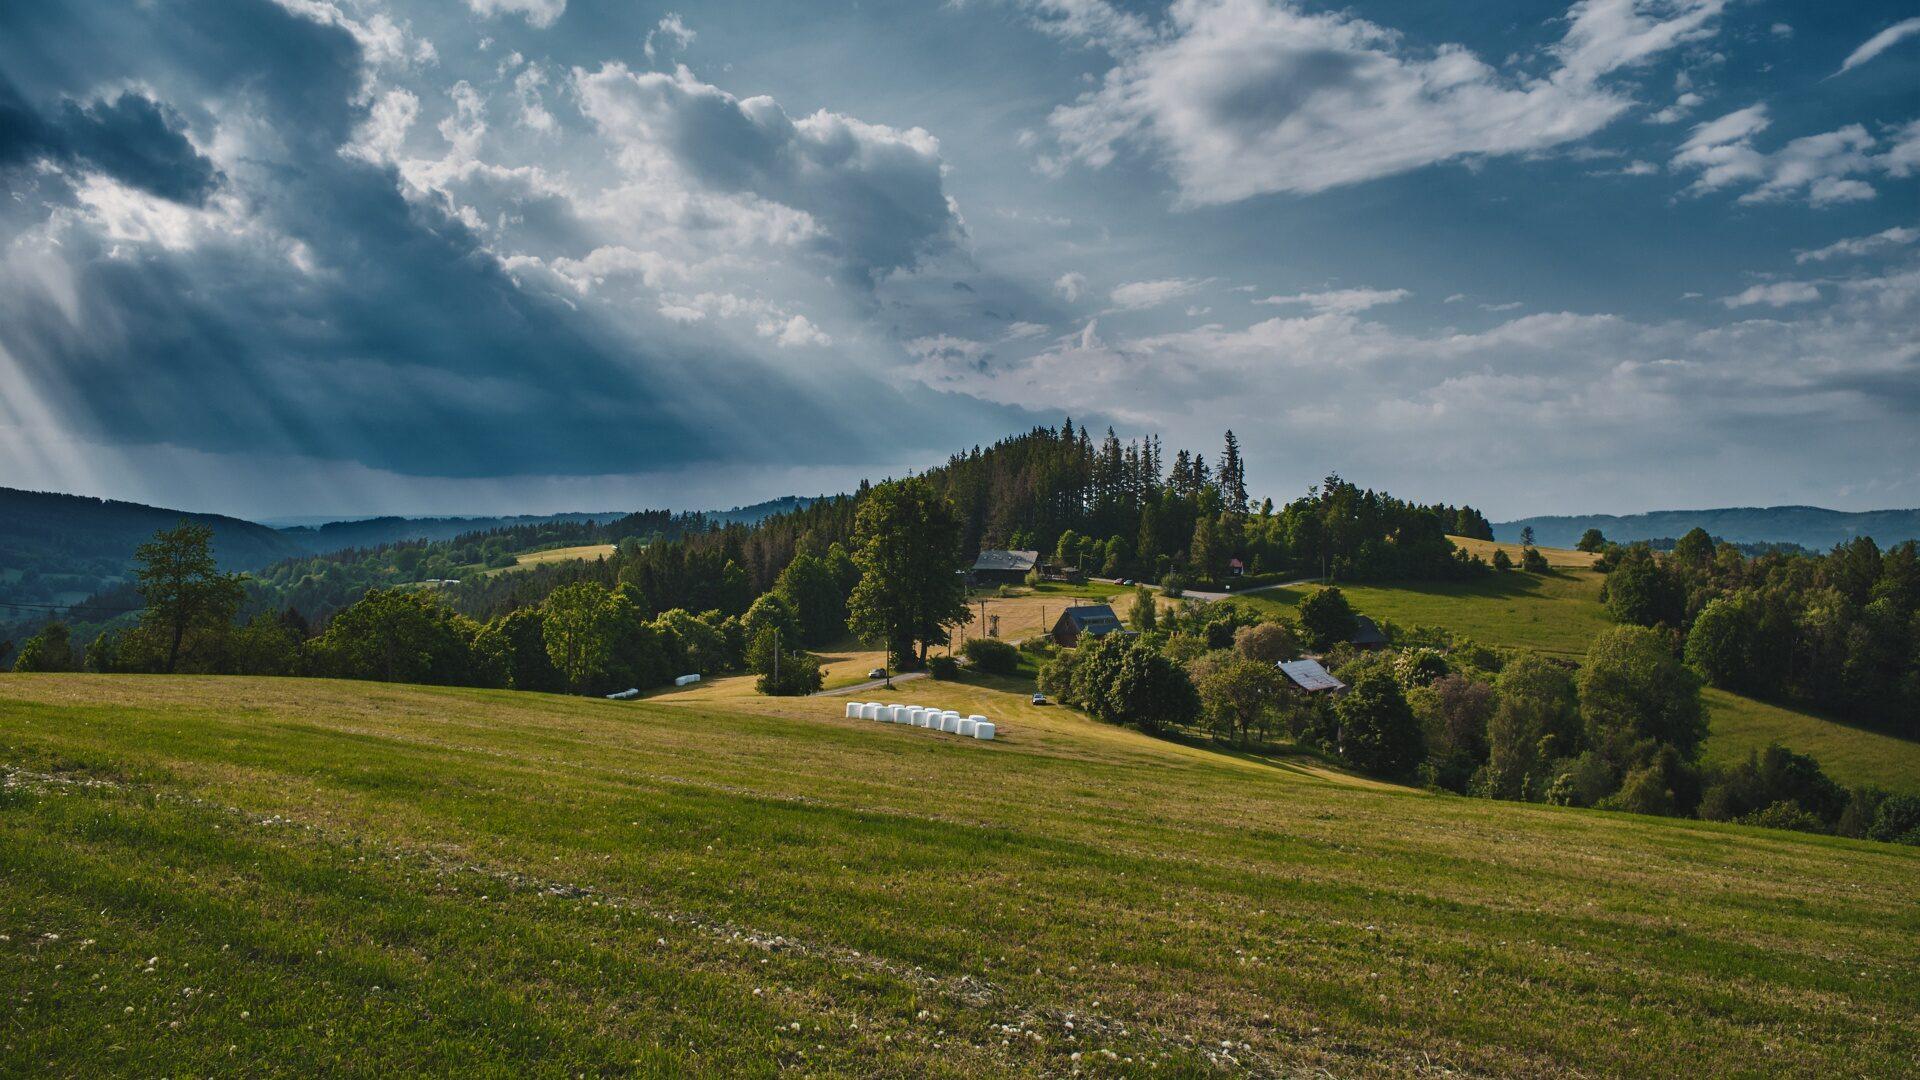 Pohled na kopec a osadu Santov